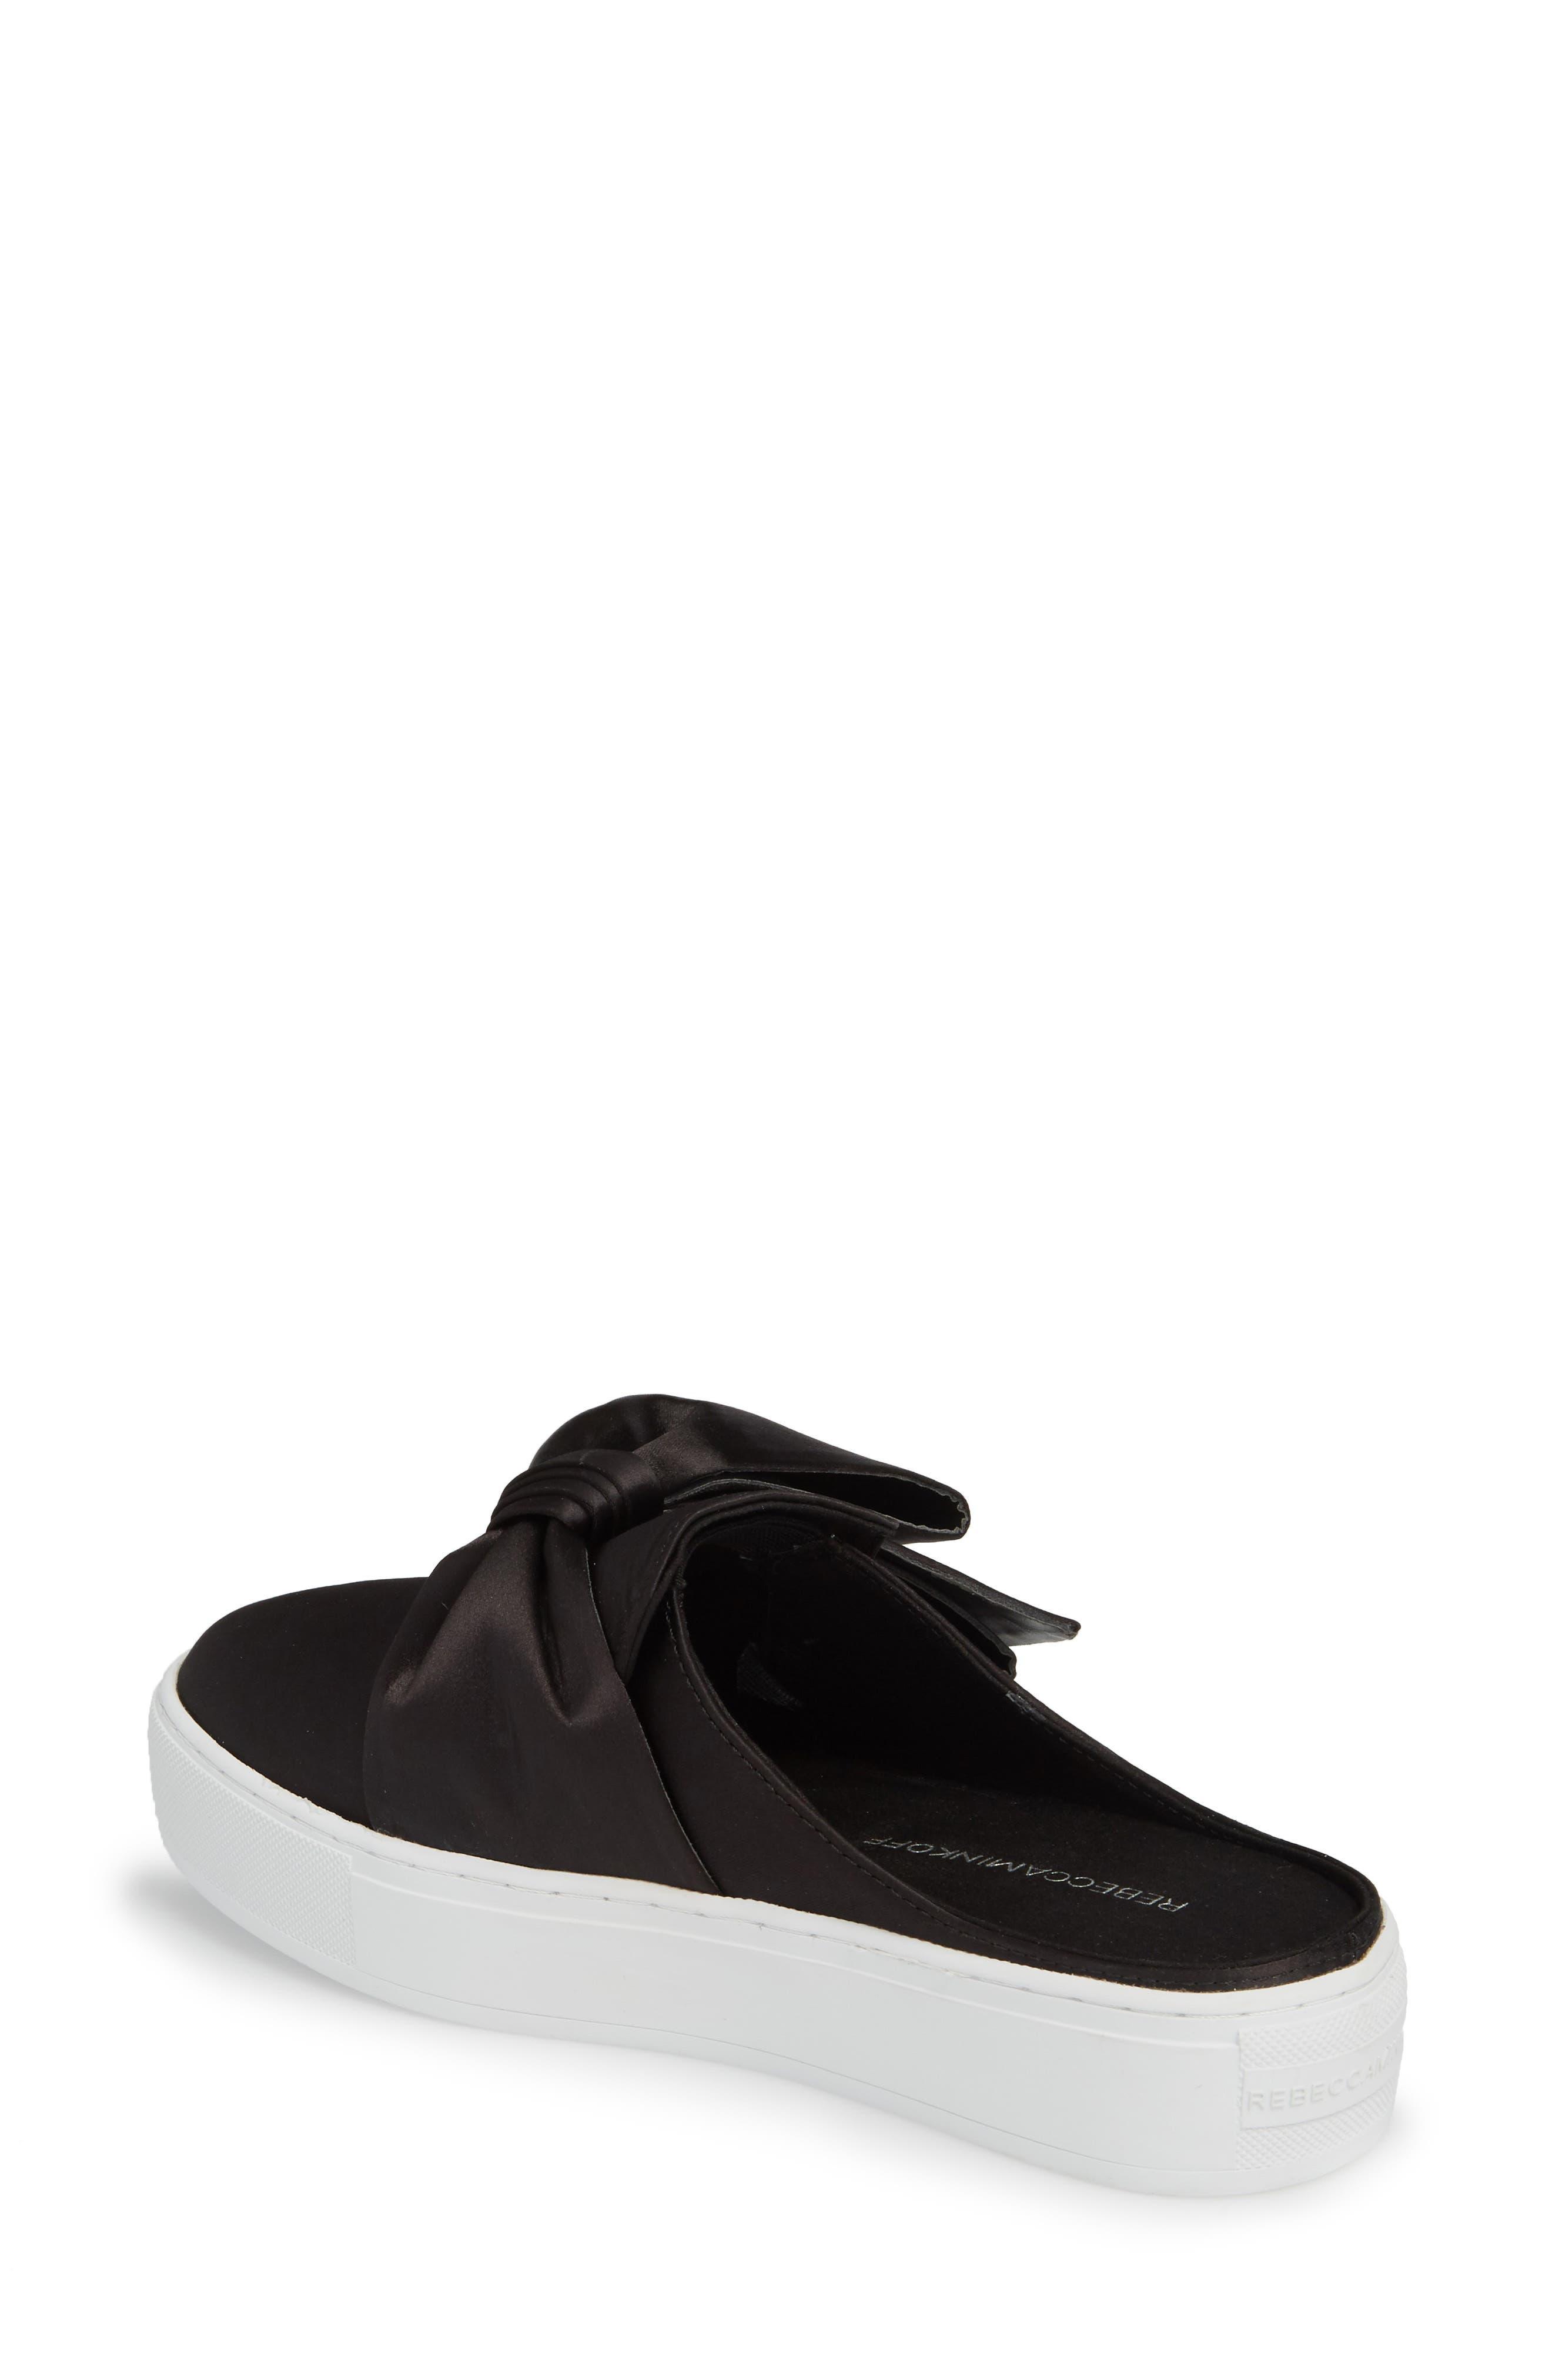 Neva Sneaker Mule,                             Alternate thumbnail 4, color,